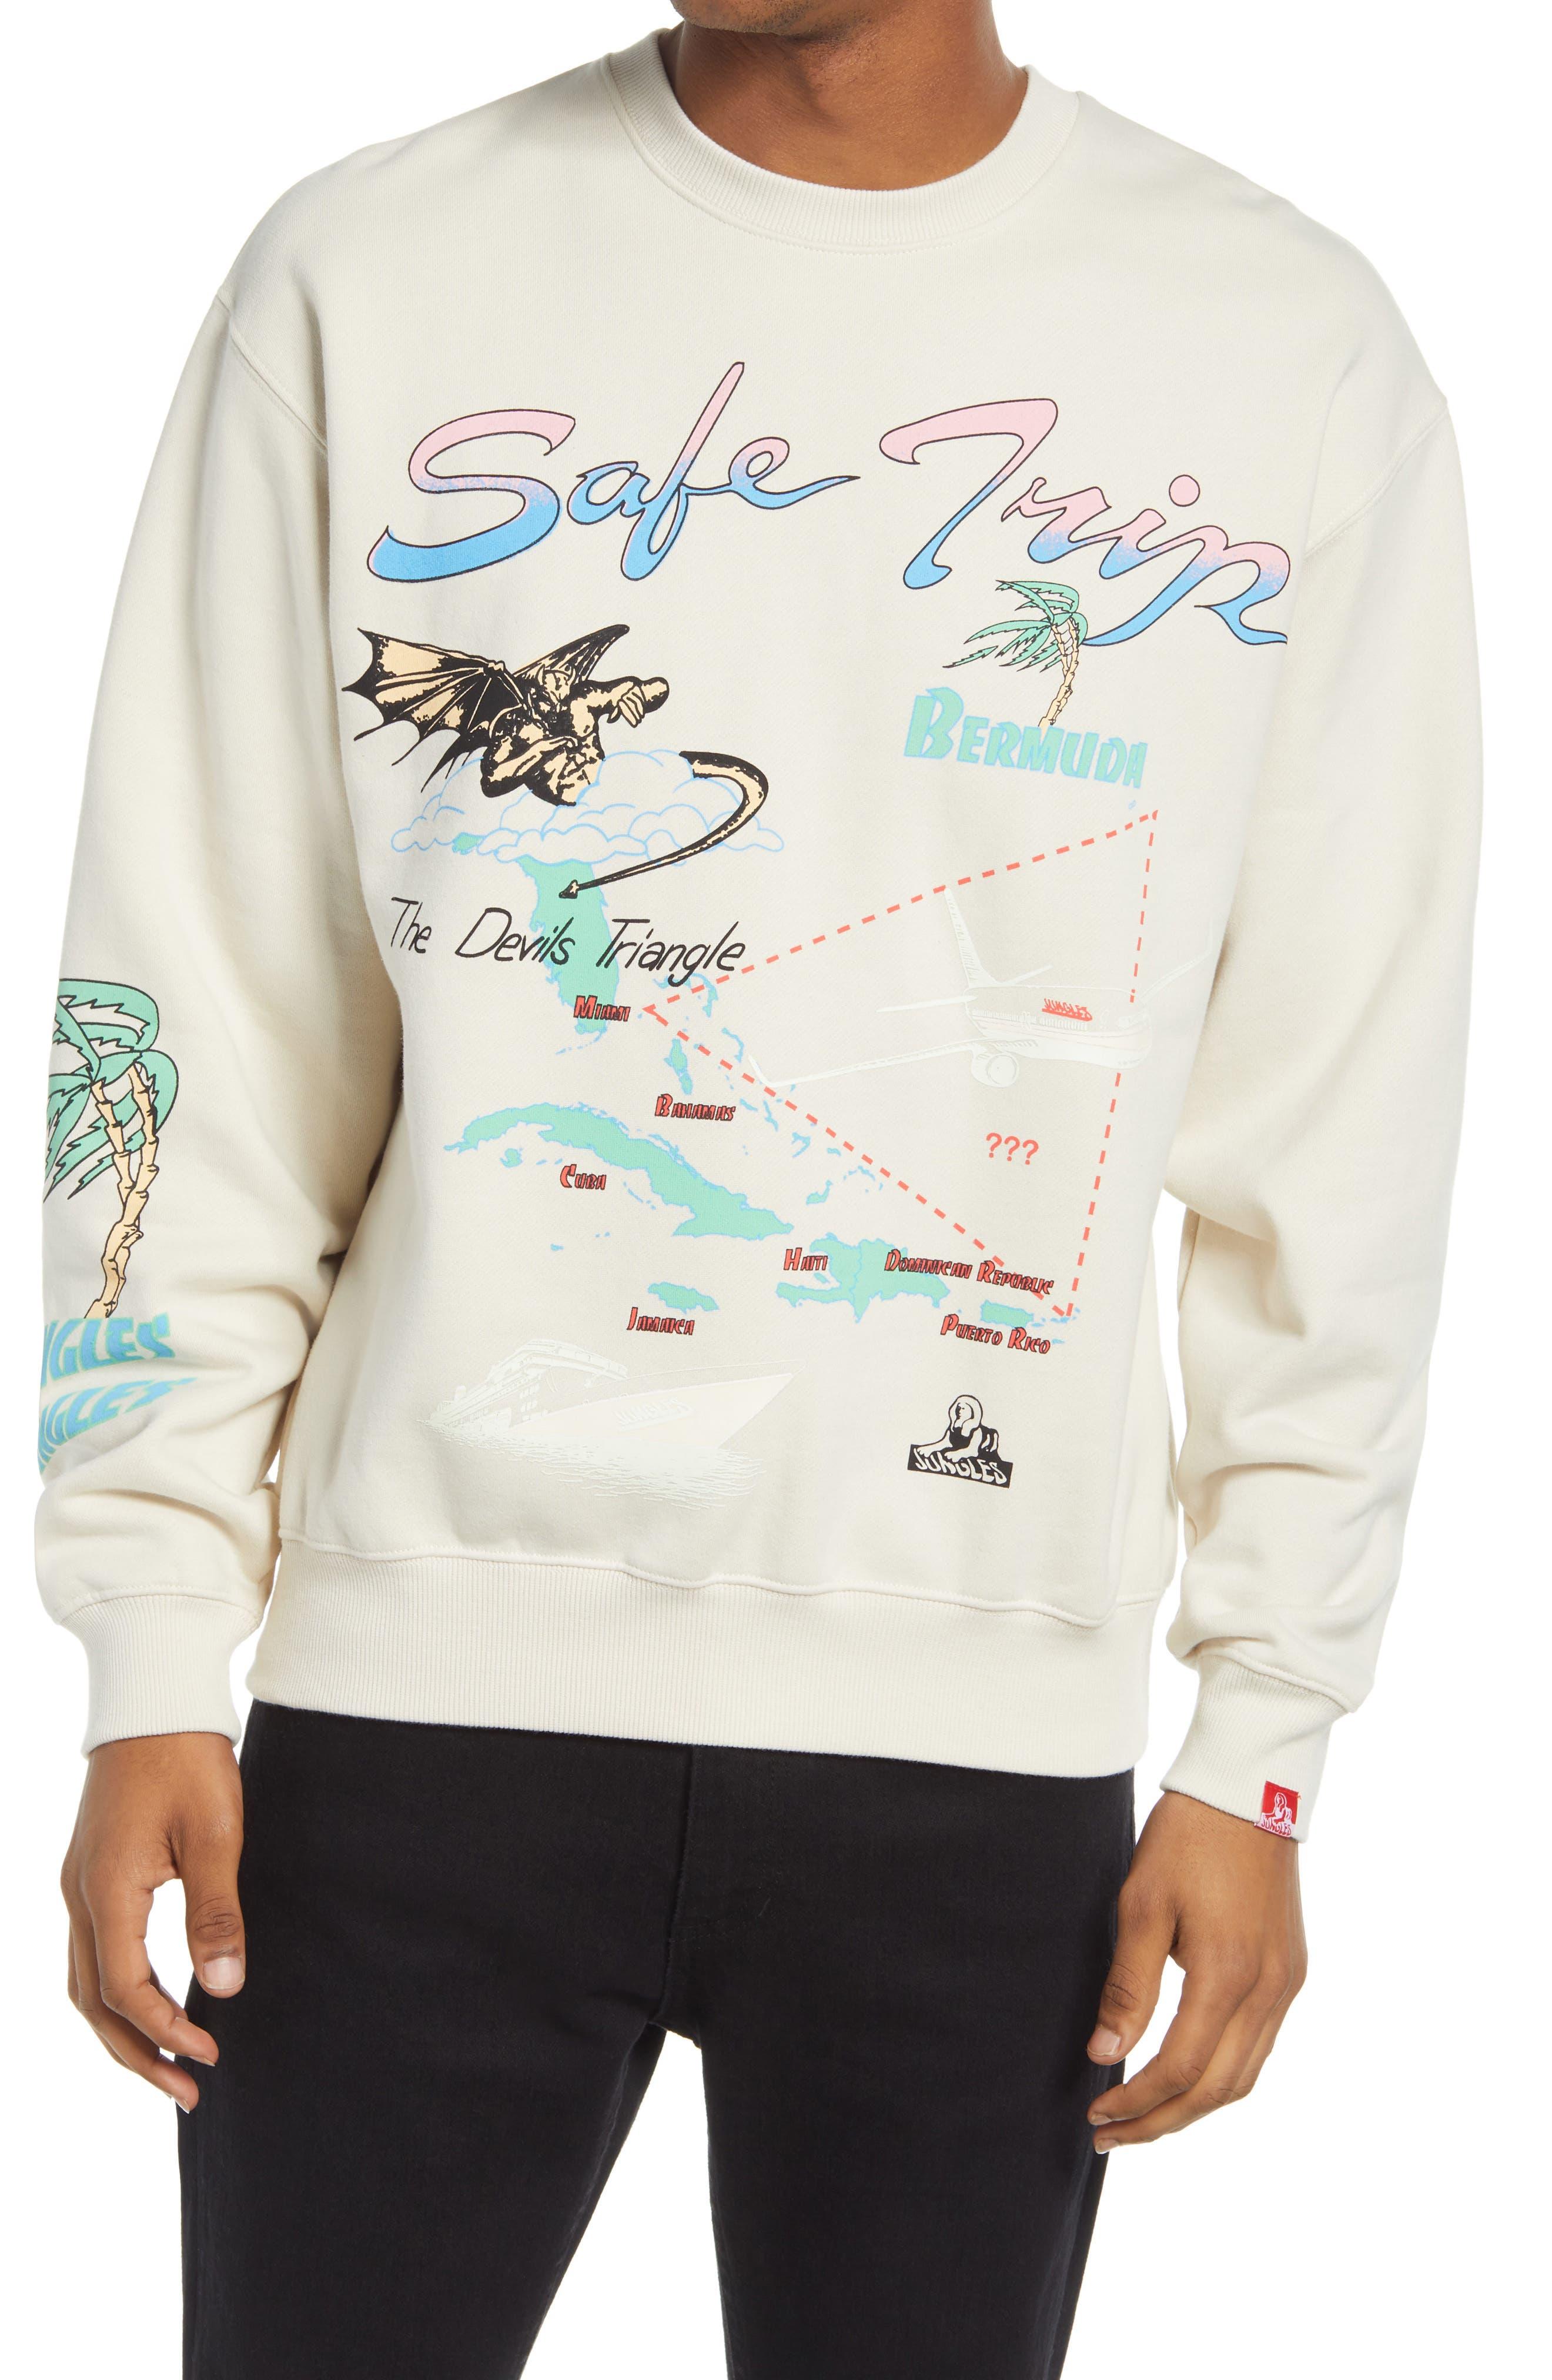 Bermuda Uv Sweatshirt